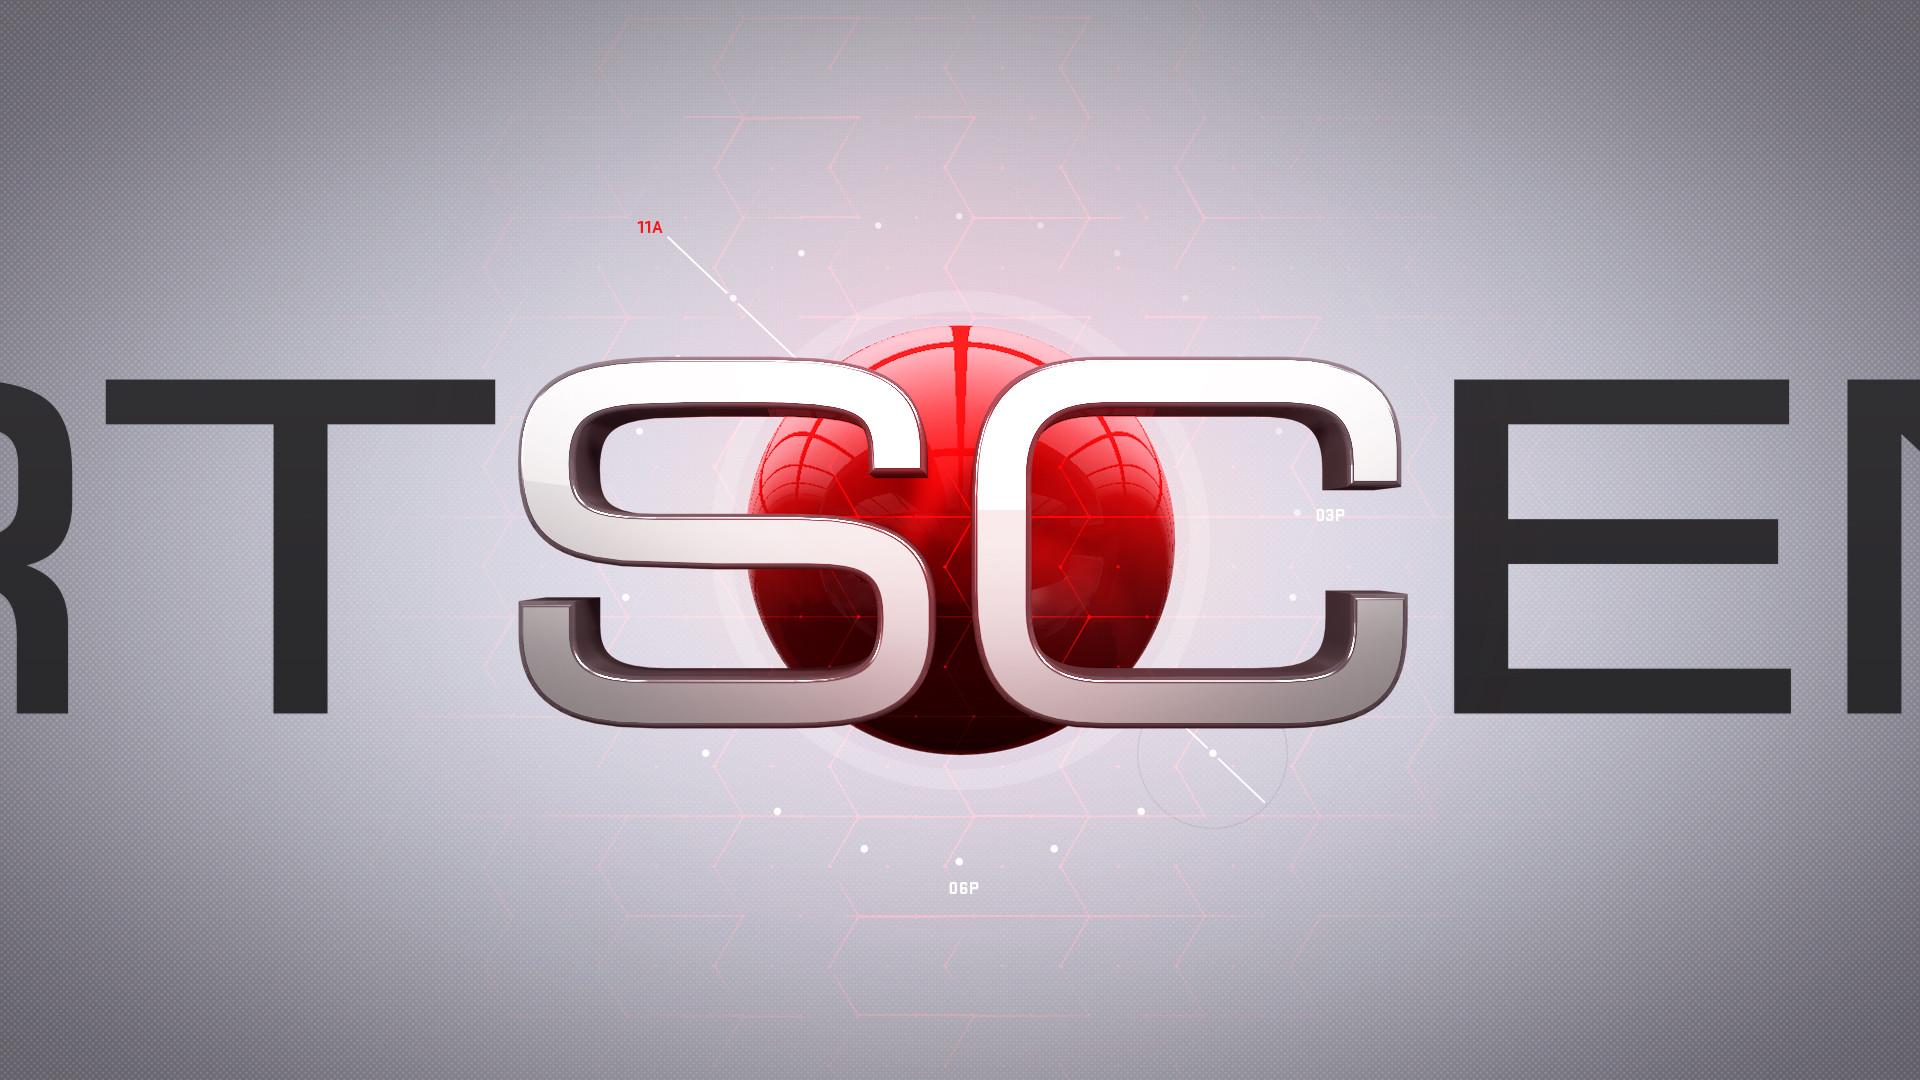 SC_logo_white_01A.jpg